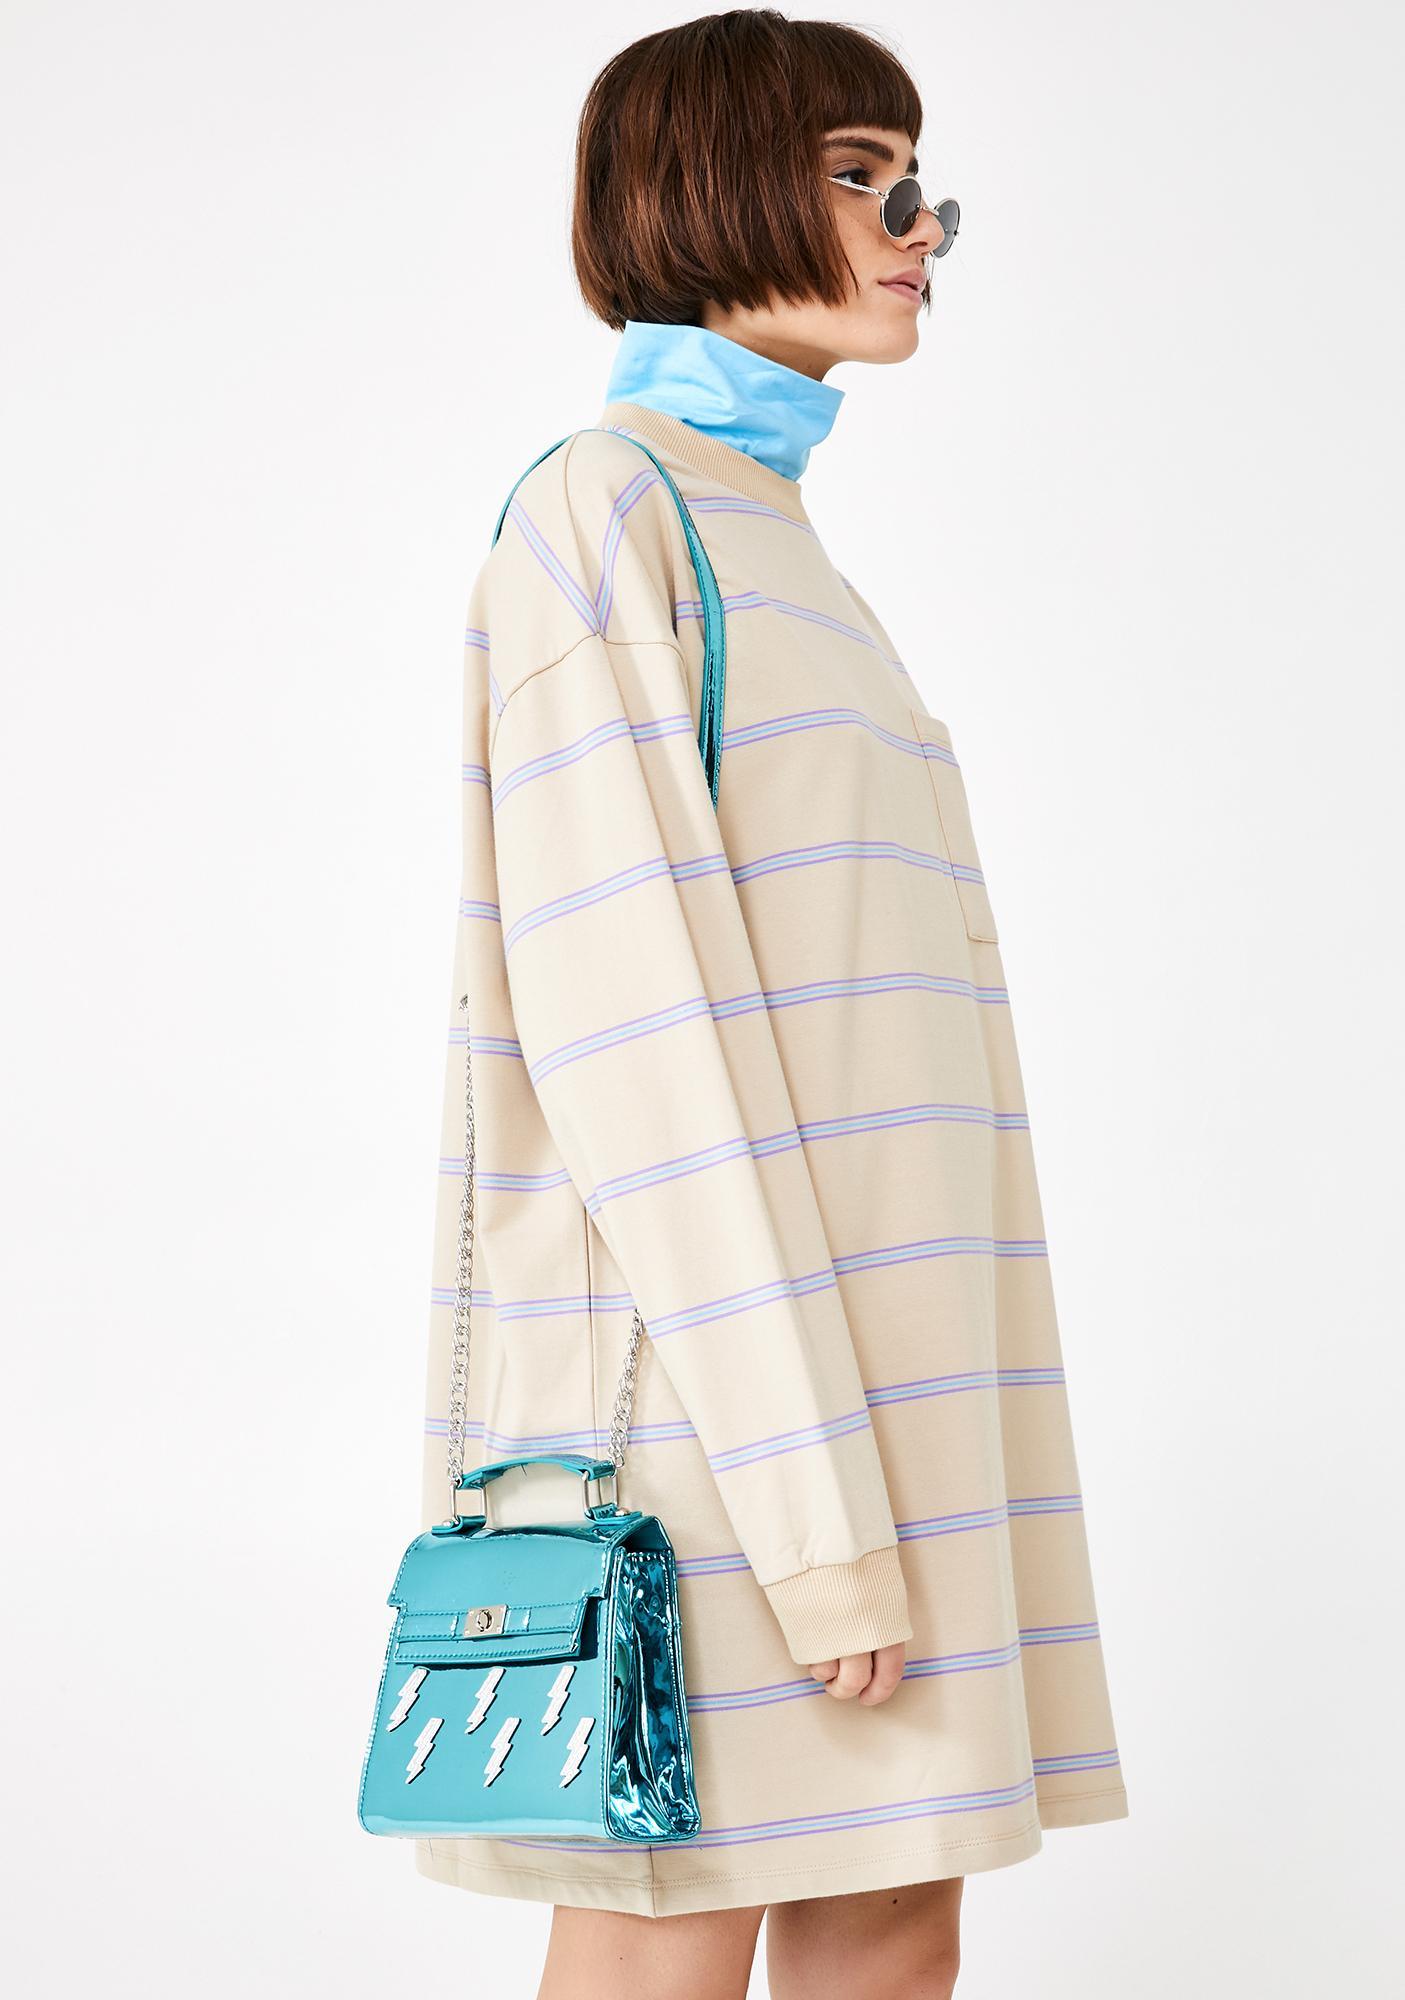 Aqua Thunder Crossbody Bag